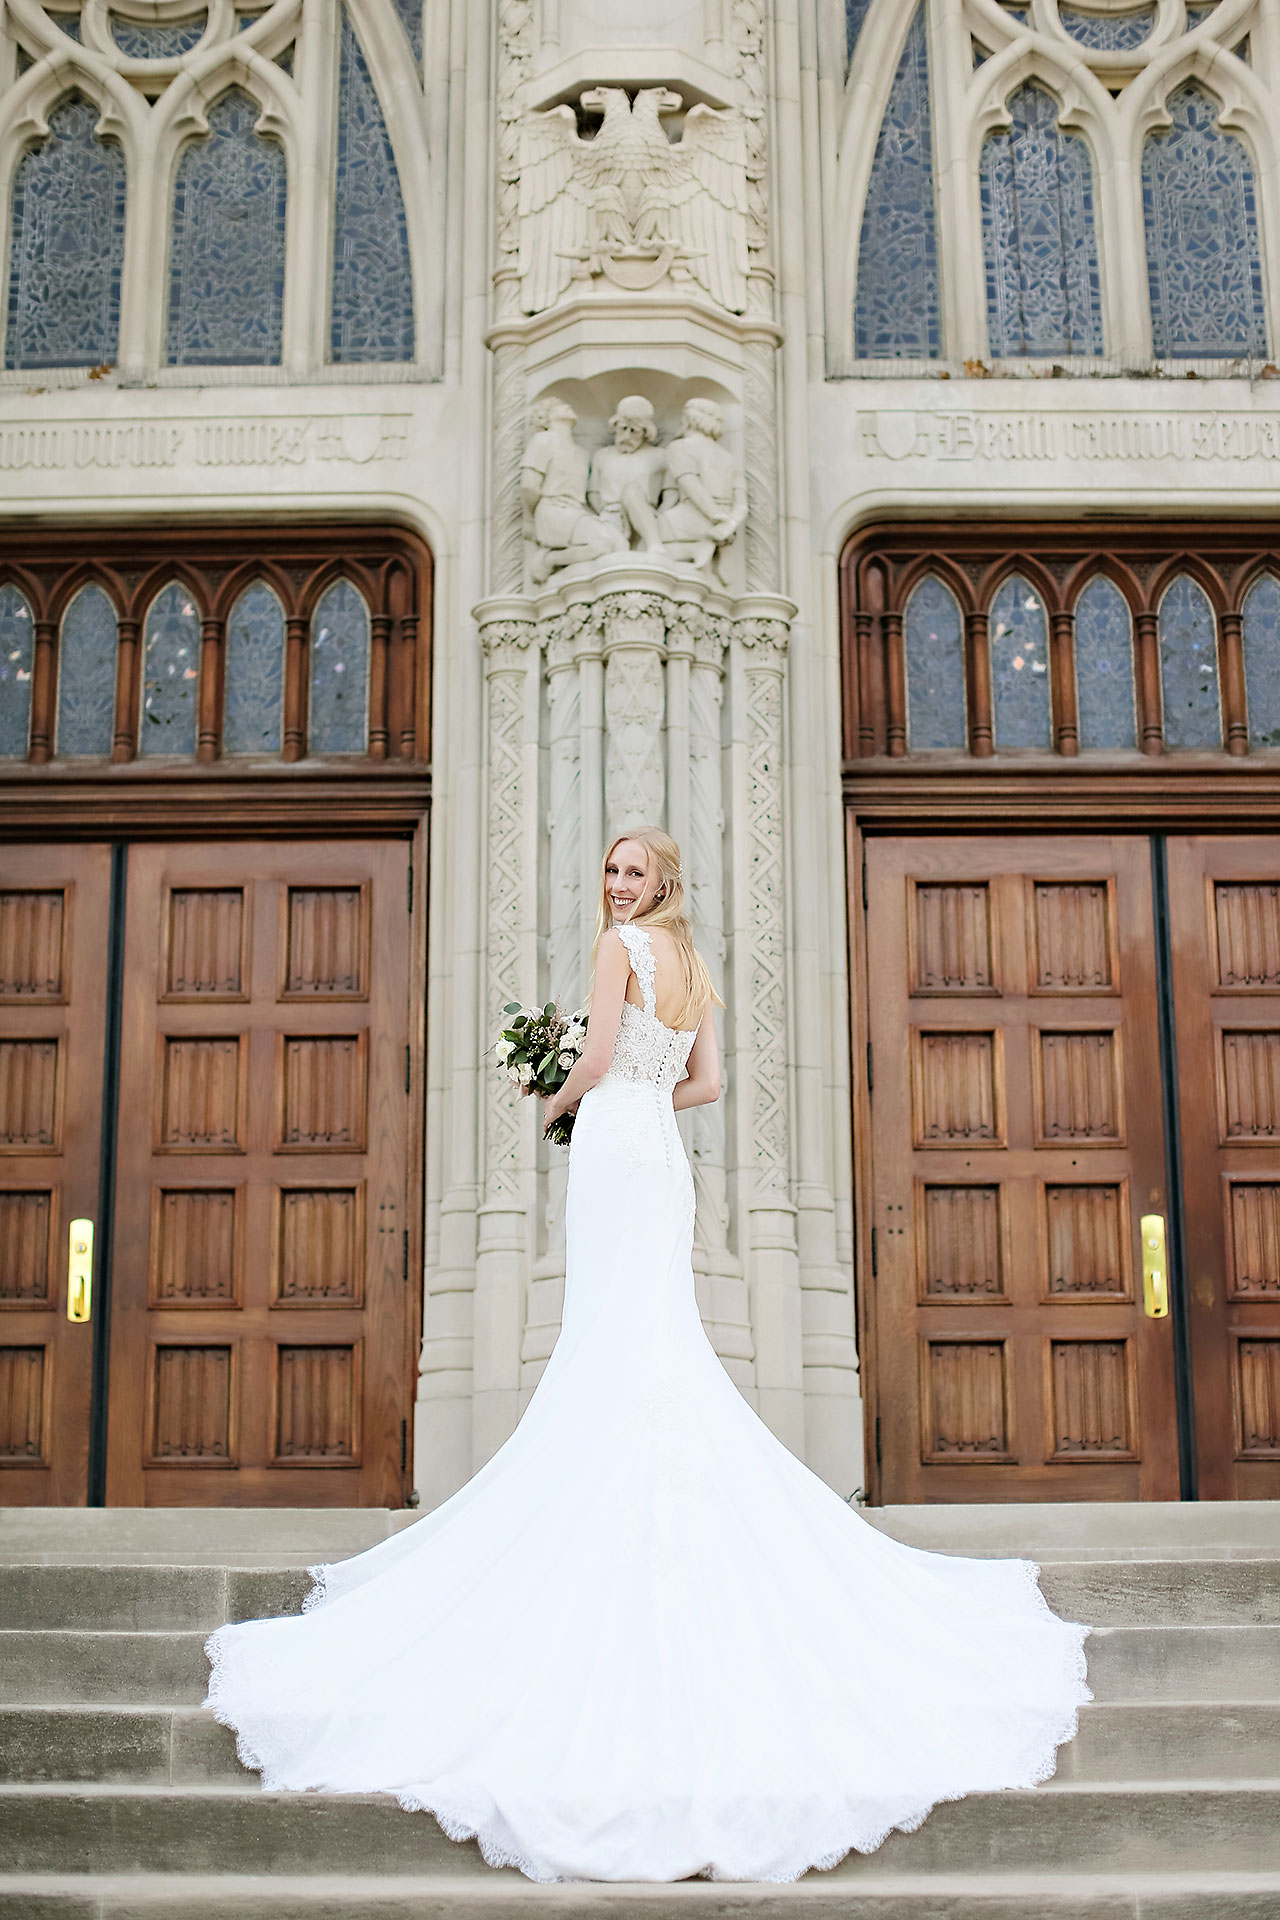 Molly Declan Scottish Rite Indianapolis Wedding 217